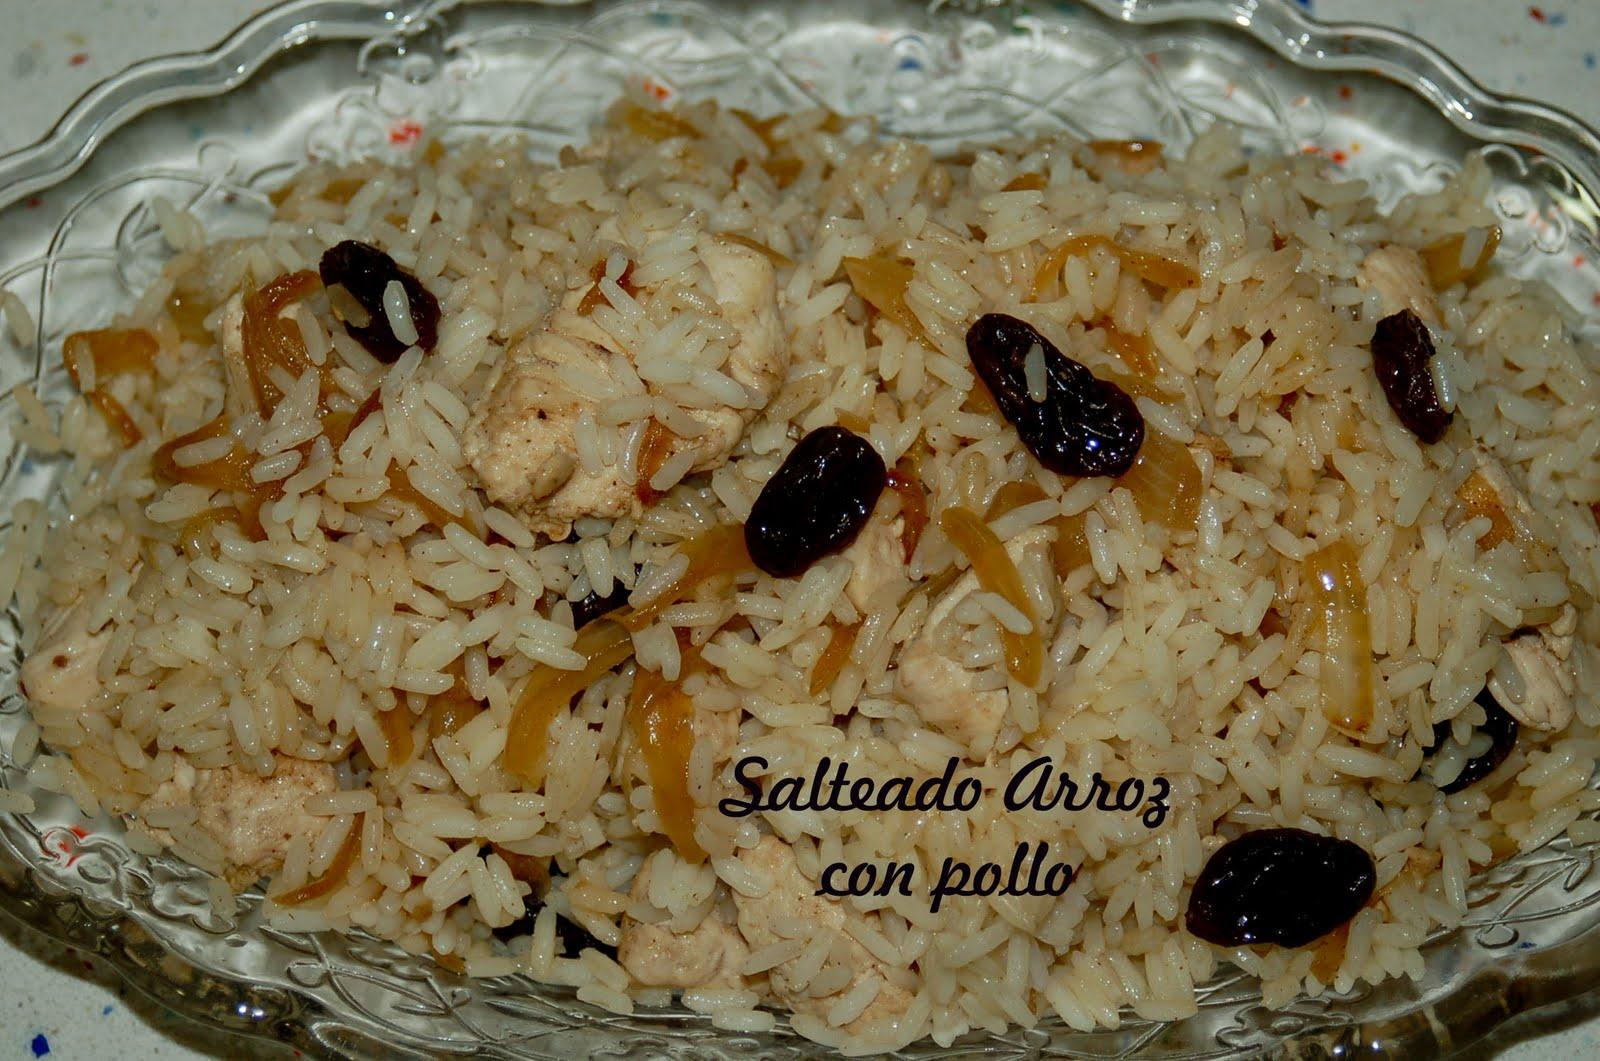 Cocinar sin miedo salteado de arroz con pollo - Arroz salteado con pollo ...